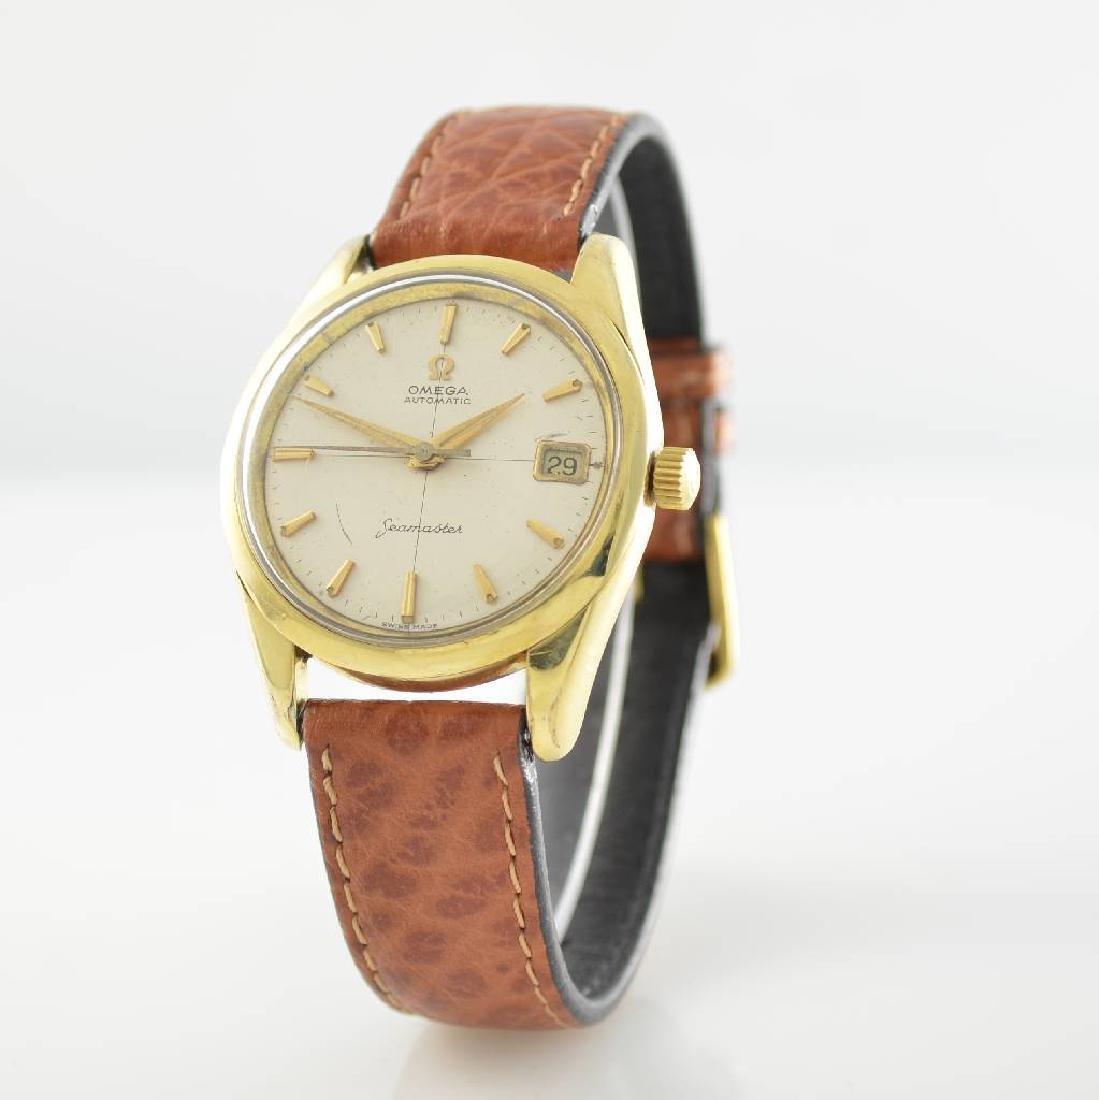 OMEGA self winding gents wristwatch model Seamaster - 3